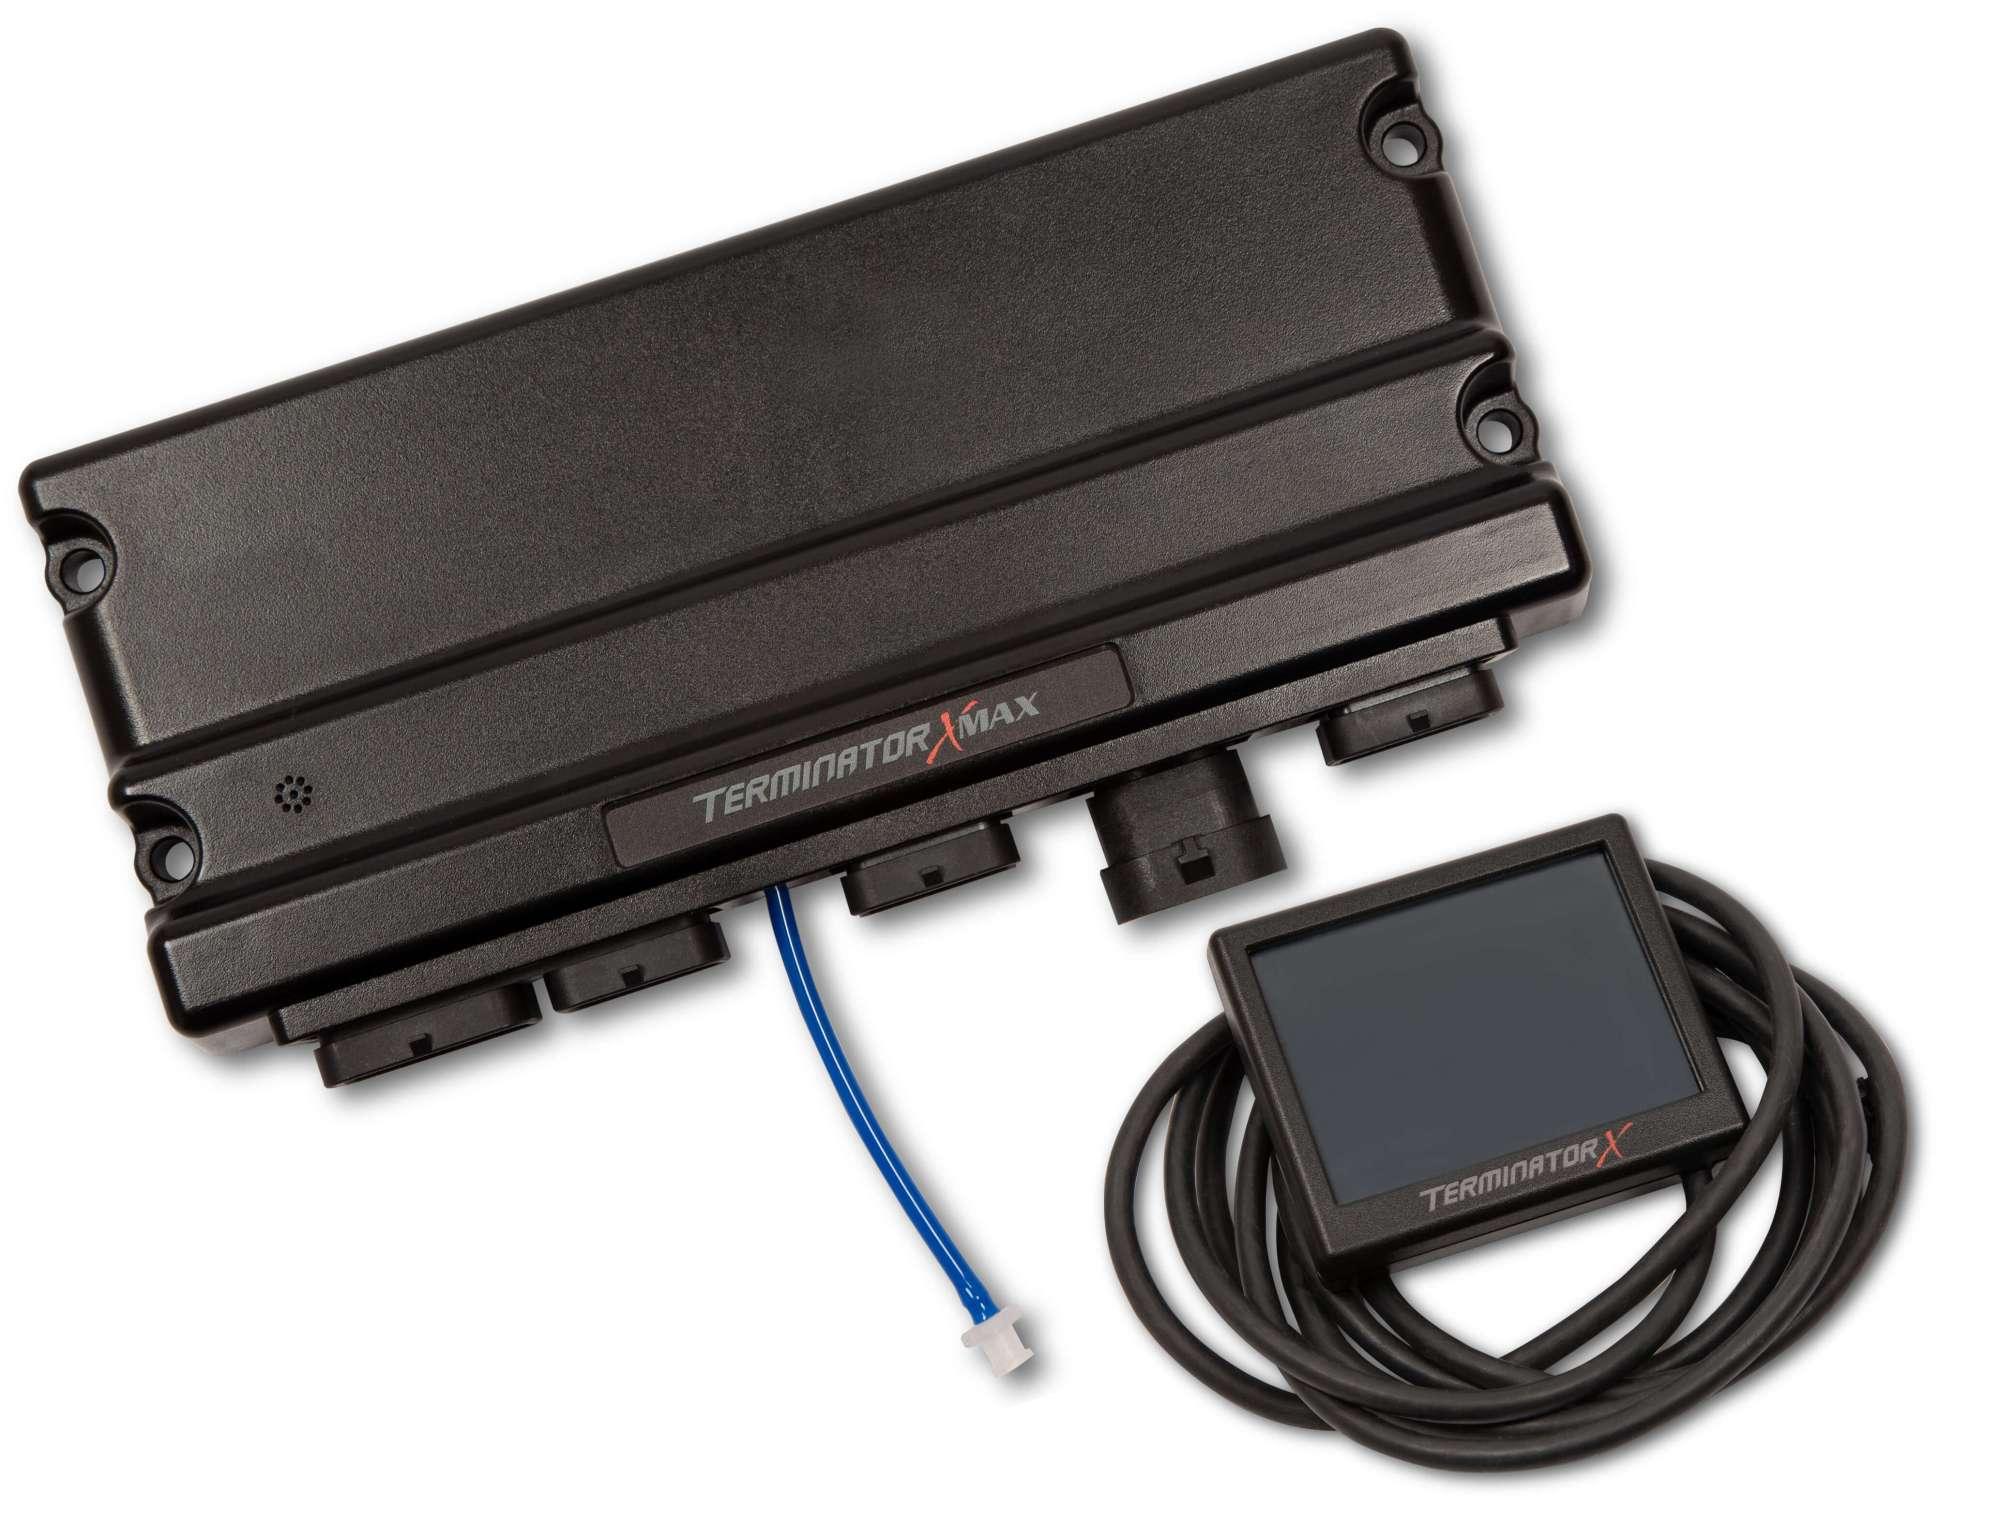 hight resolution of 550 916 terminator x max ls1 24x 1x mpfi kit with transmission control